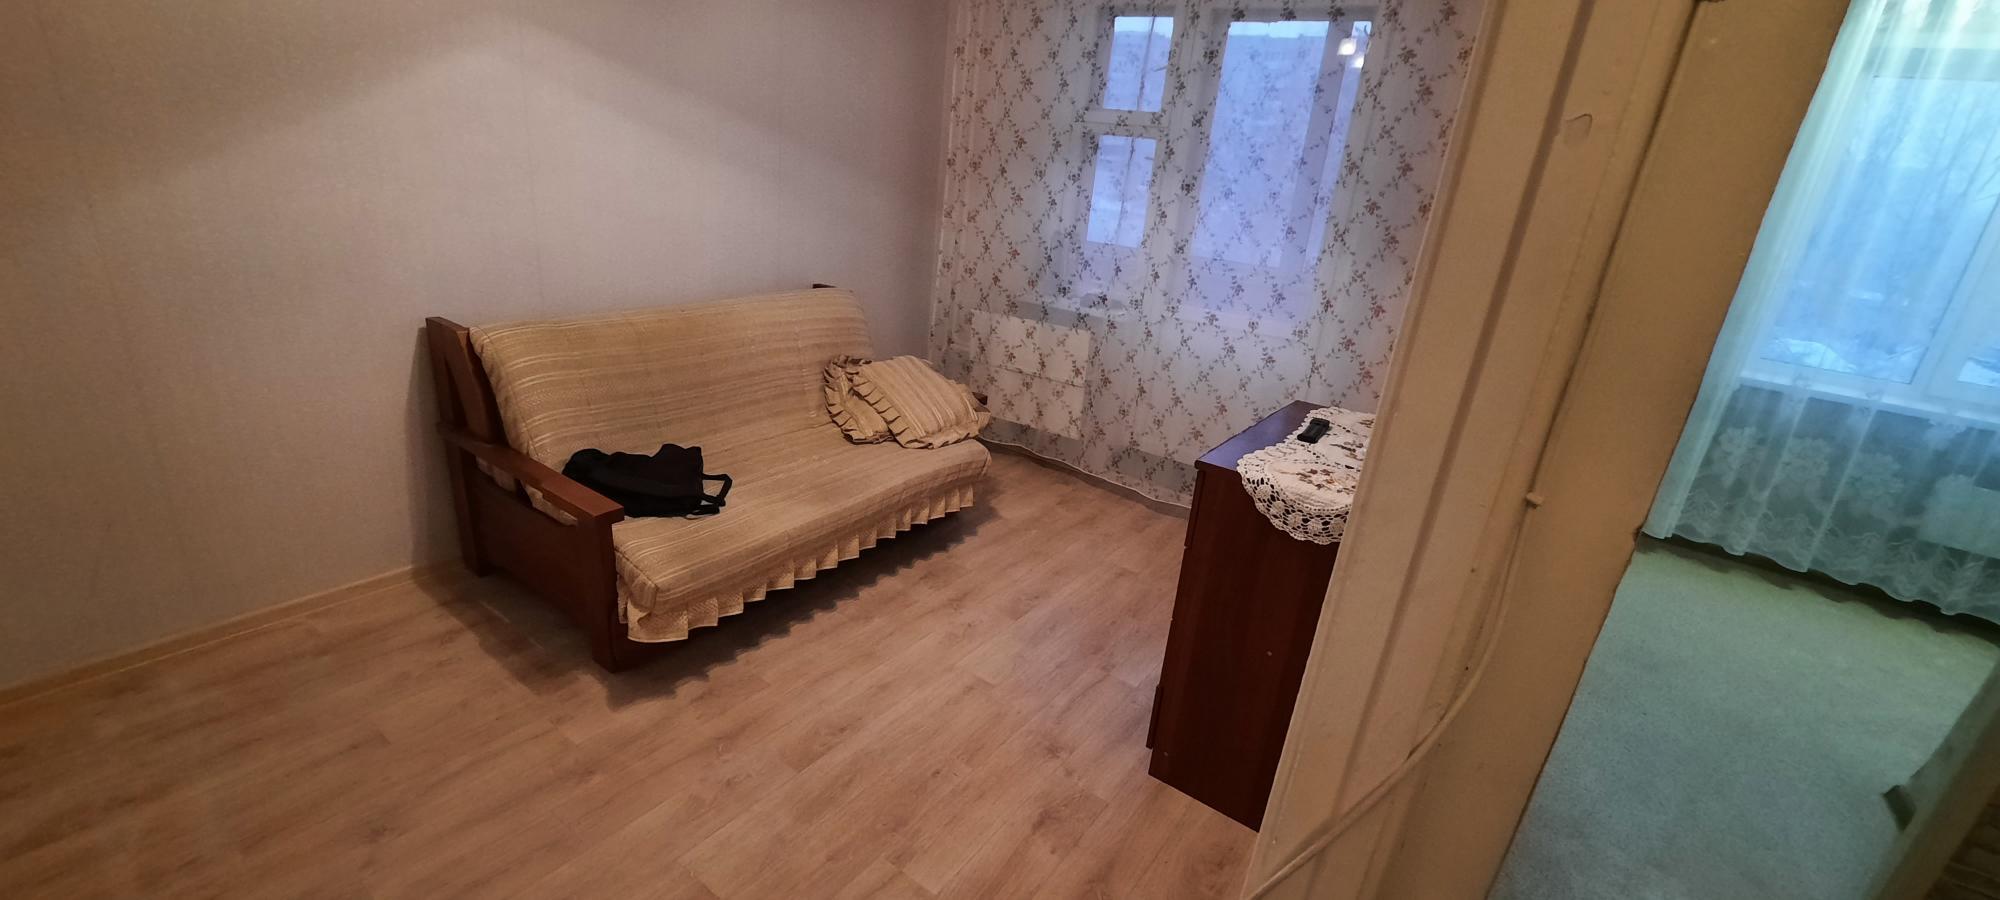 1к квартира проспект Металлургов, 4 | 12500 | аренда в Красноярске фото 0